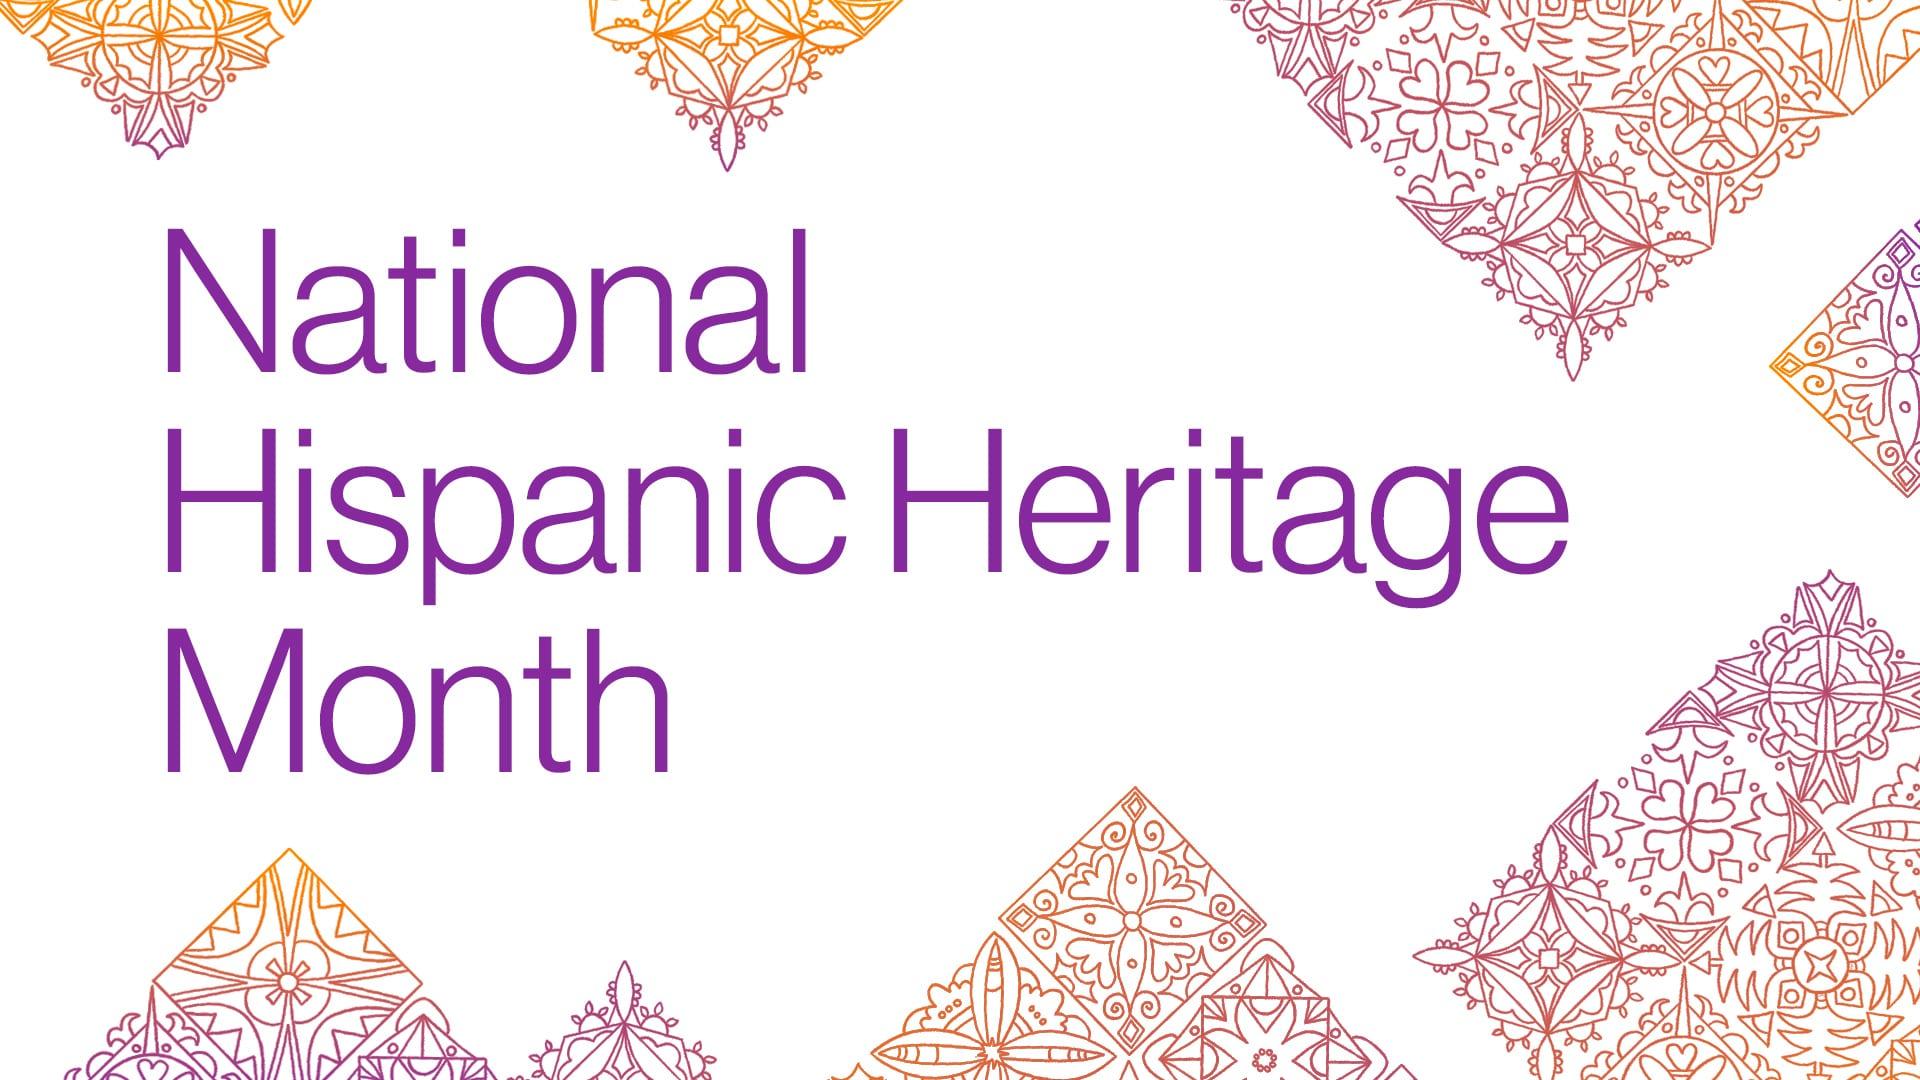 Hispanic, Latino, Latin(x), Spanish: Clarifying Terms for Hispanic Heritage Month